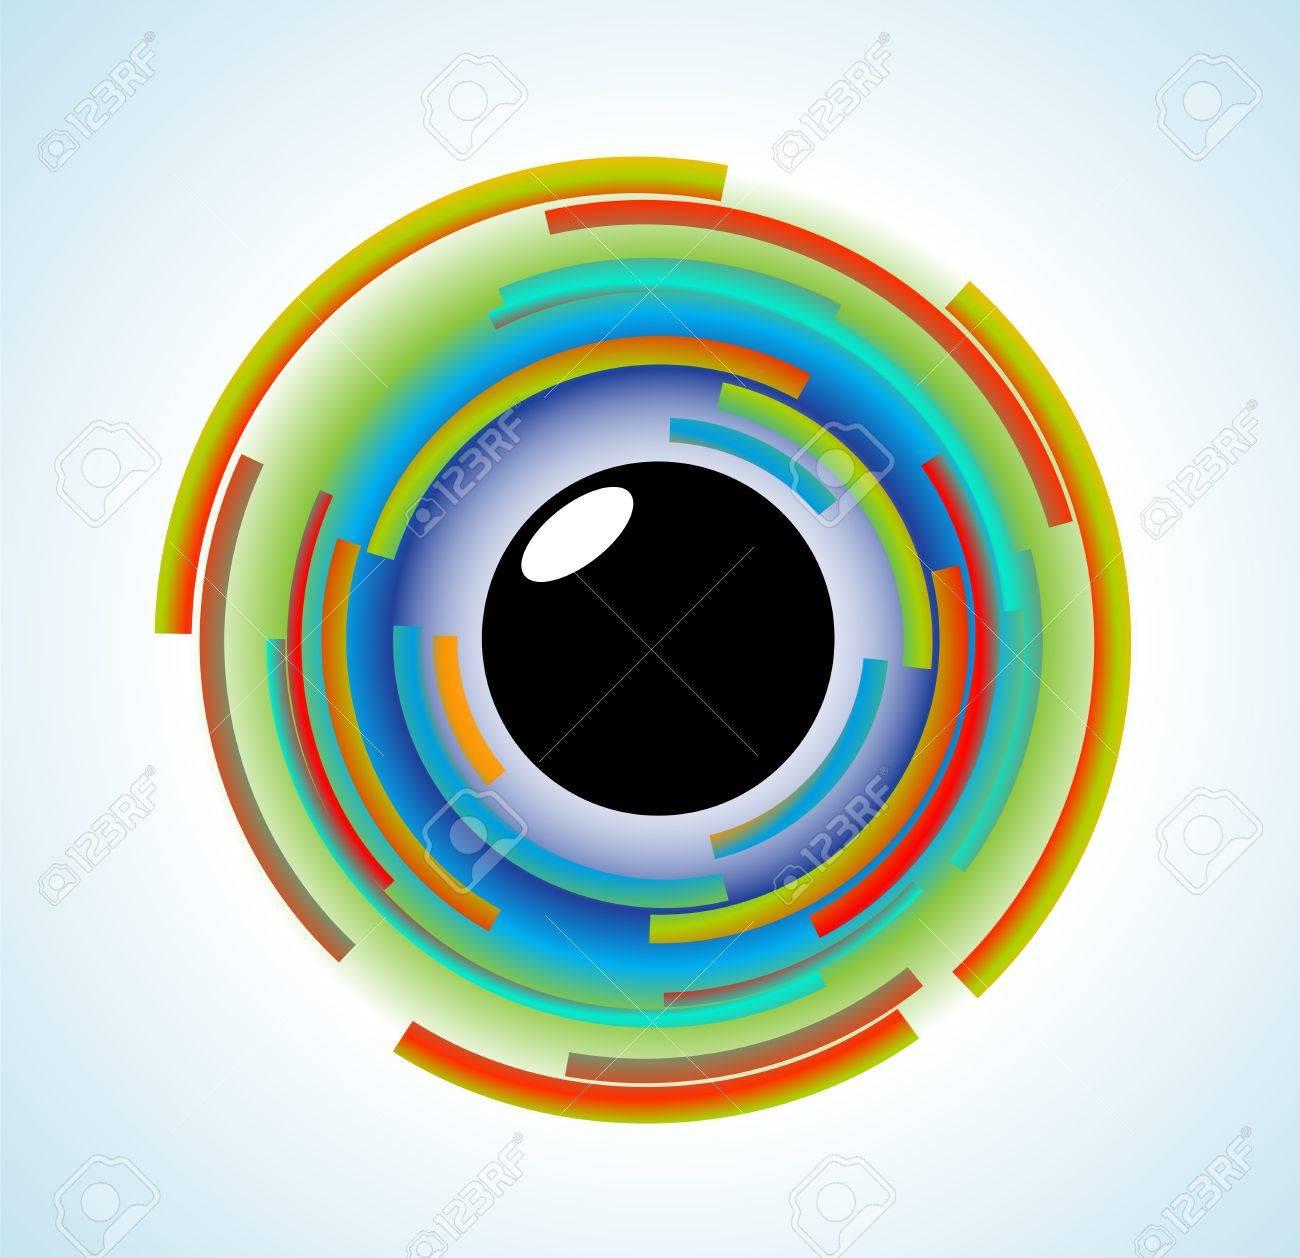 abstract symbol of a human eye Stock Vector - 20935626